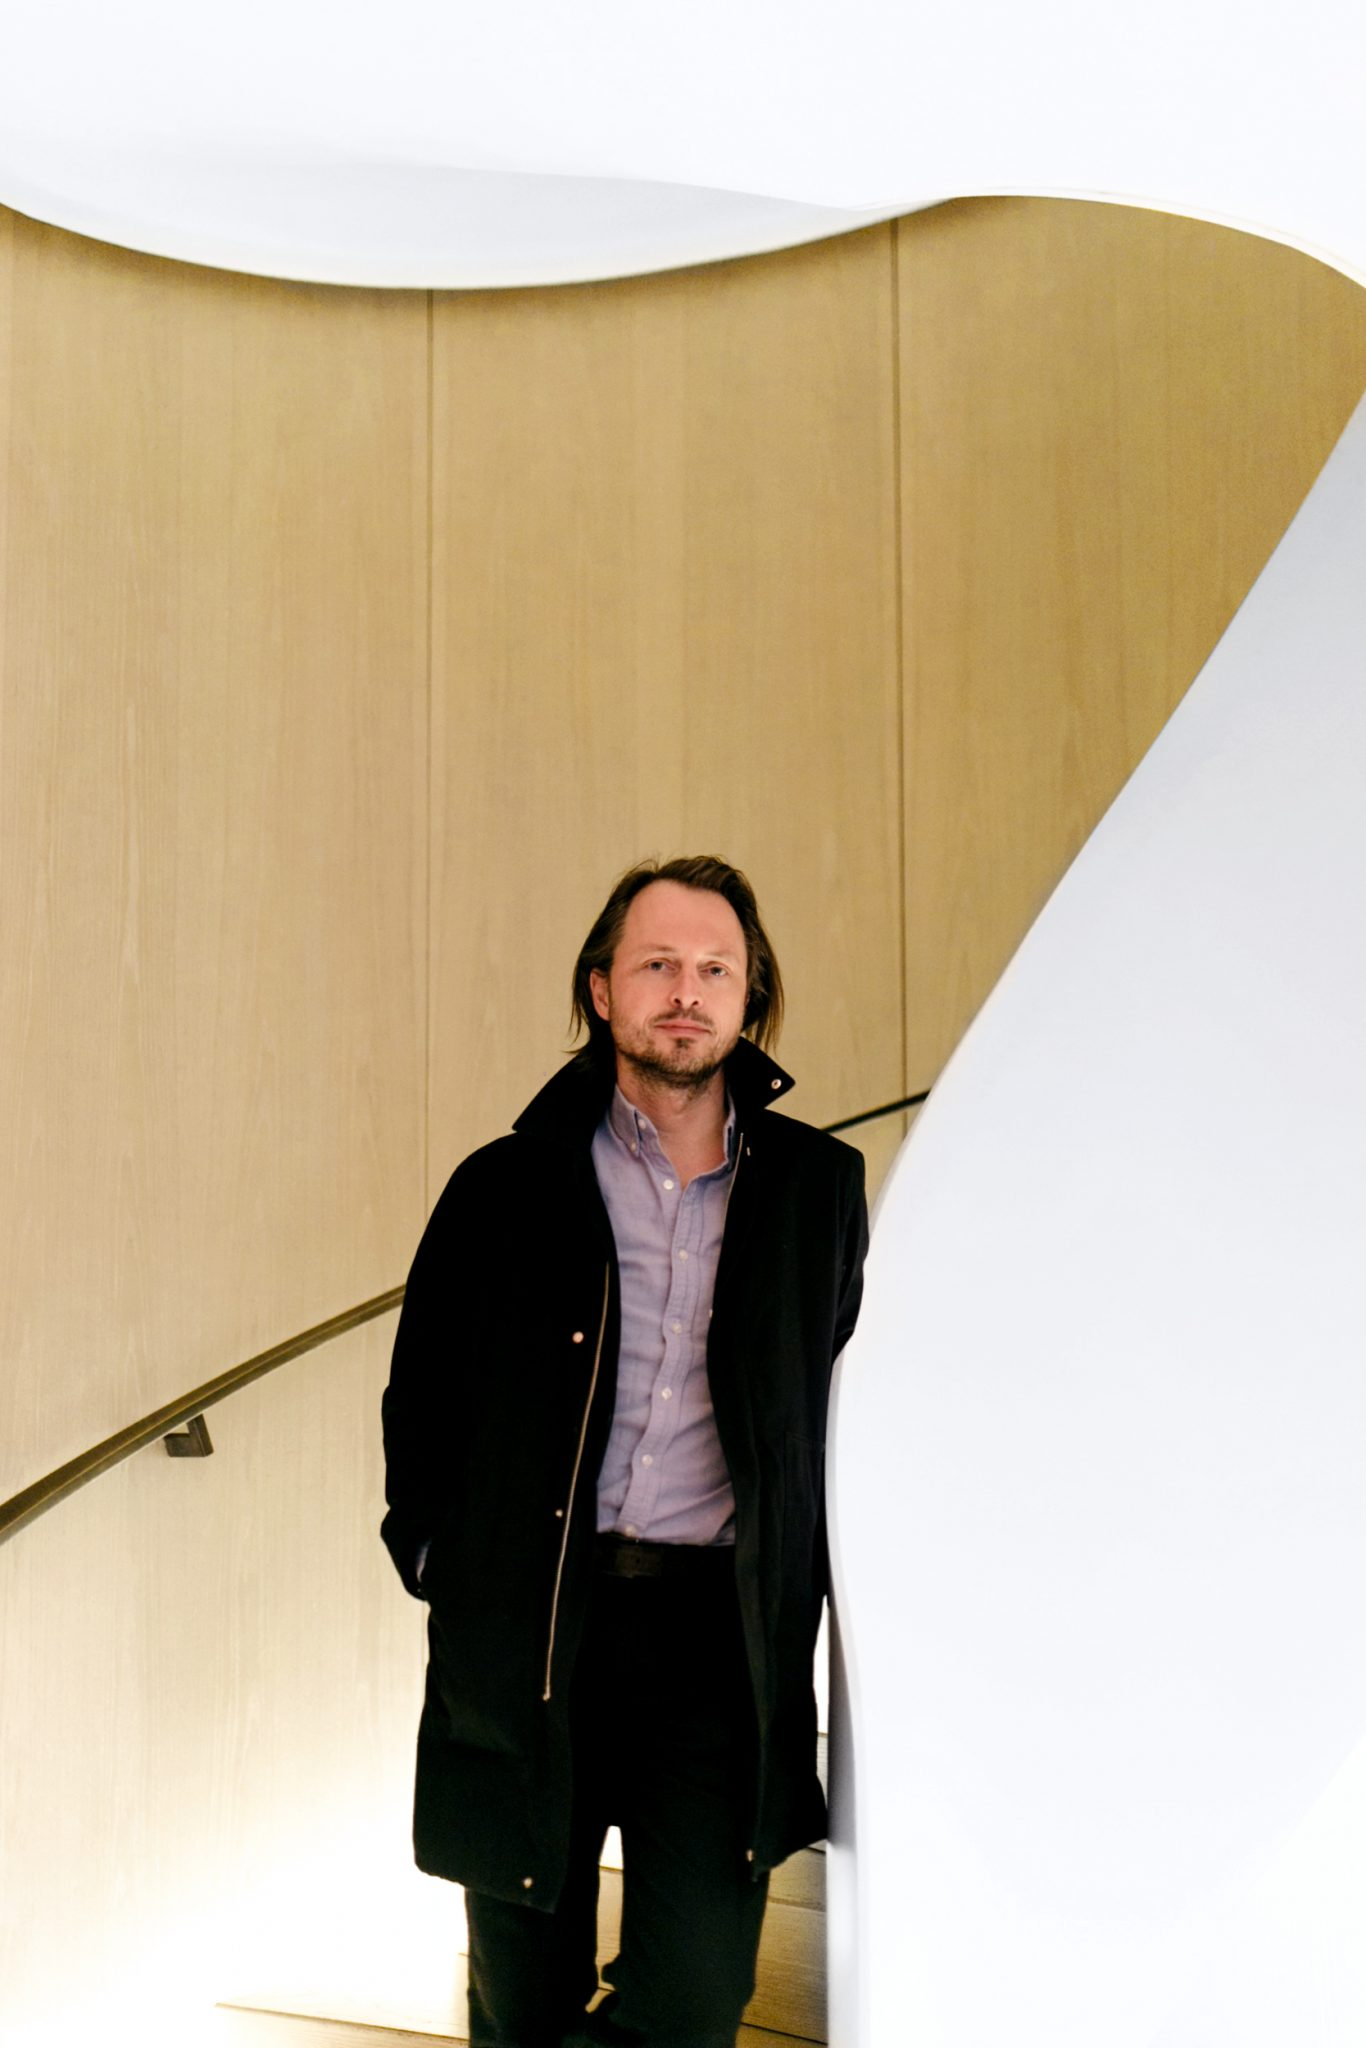 Nikolas Koenig on Branding and Becoming a Leading Hotel Photographer